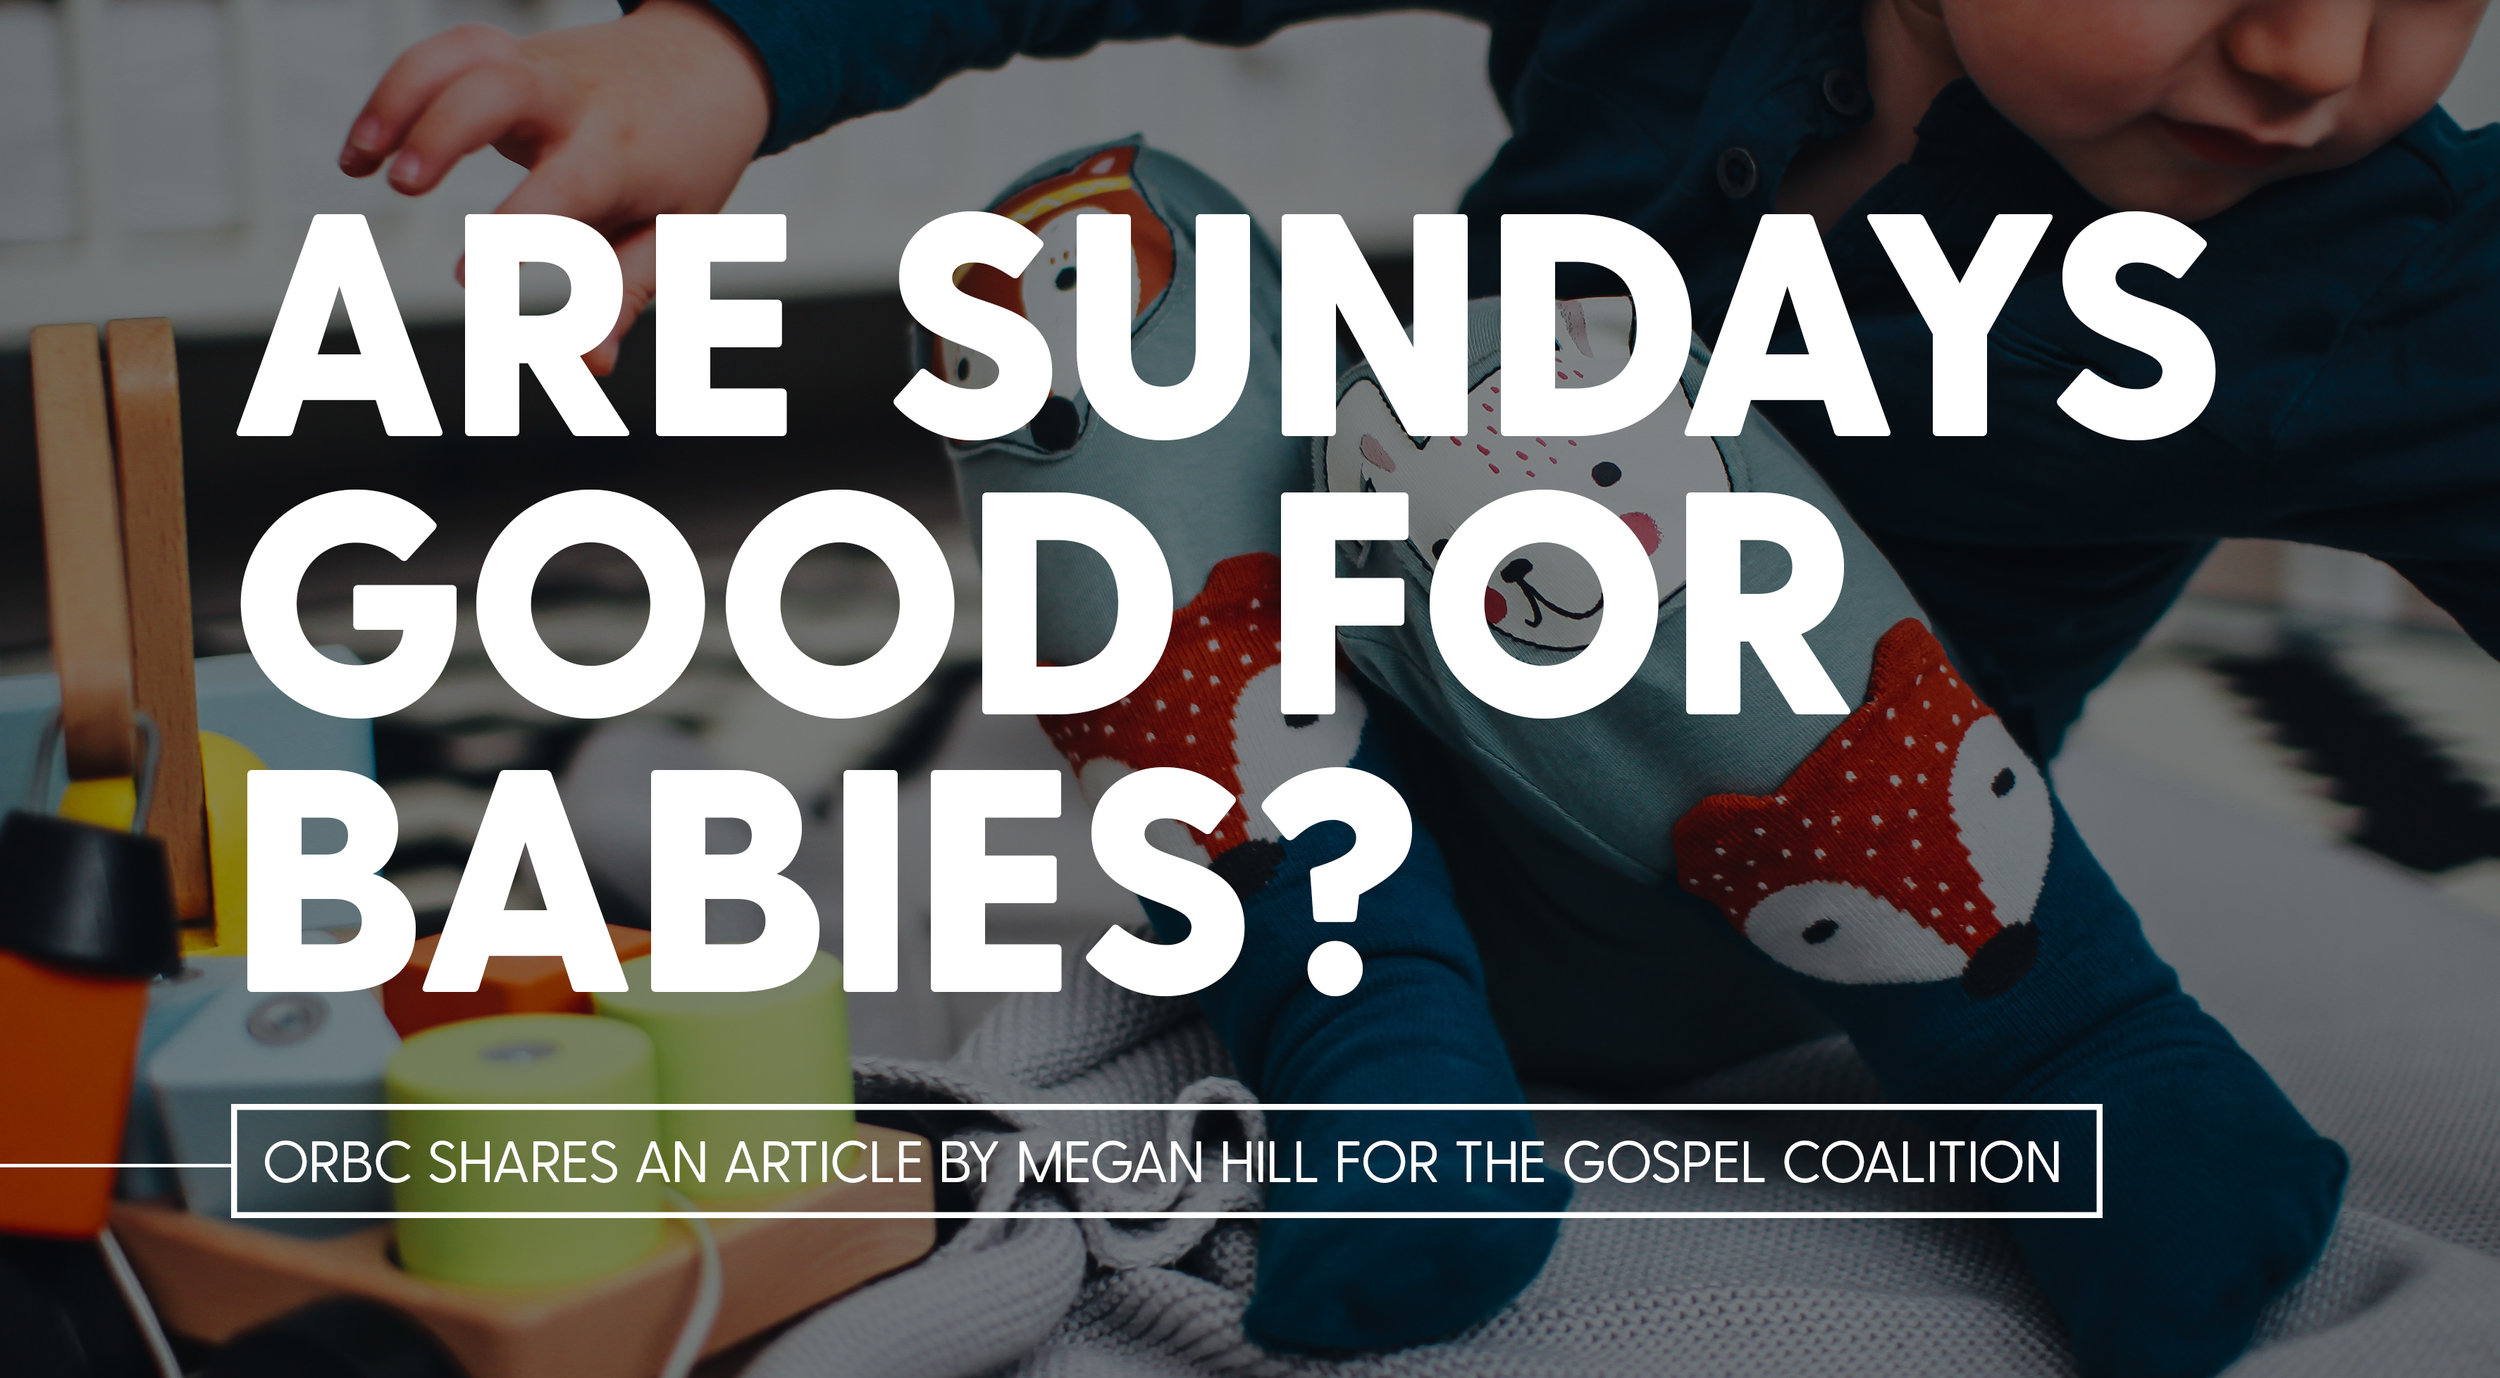 Are Sundays Good for Babies.jpg